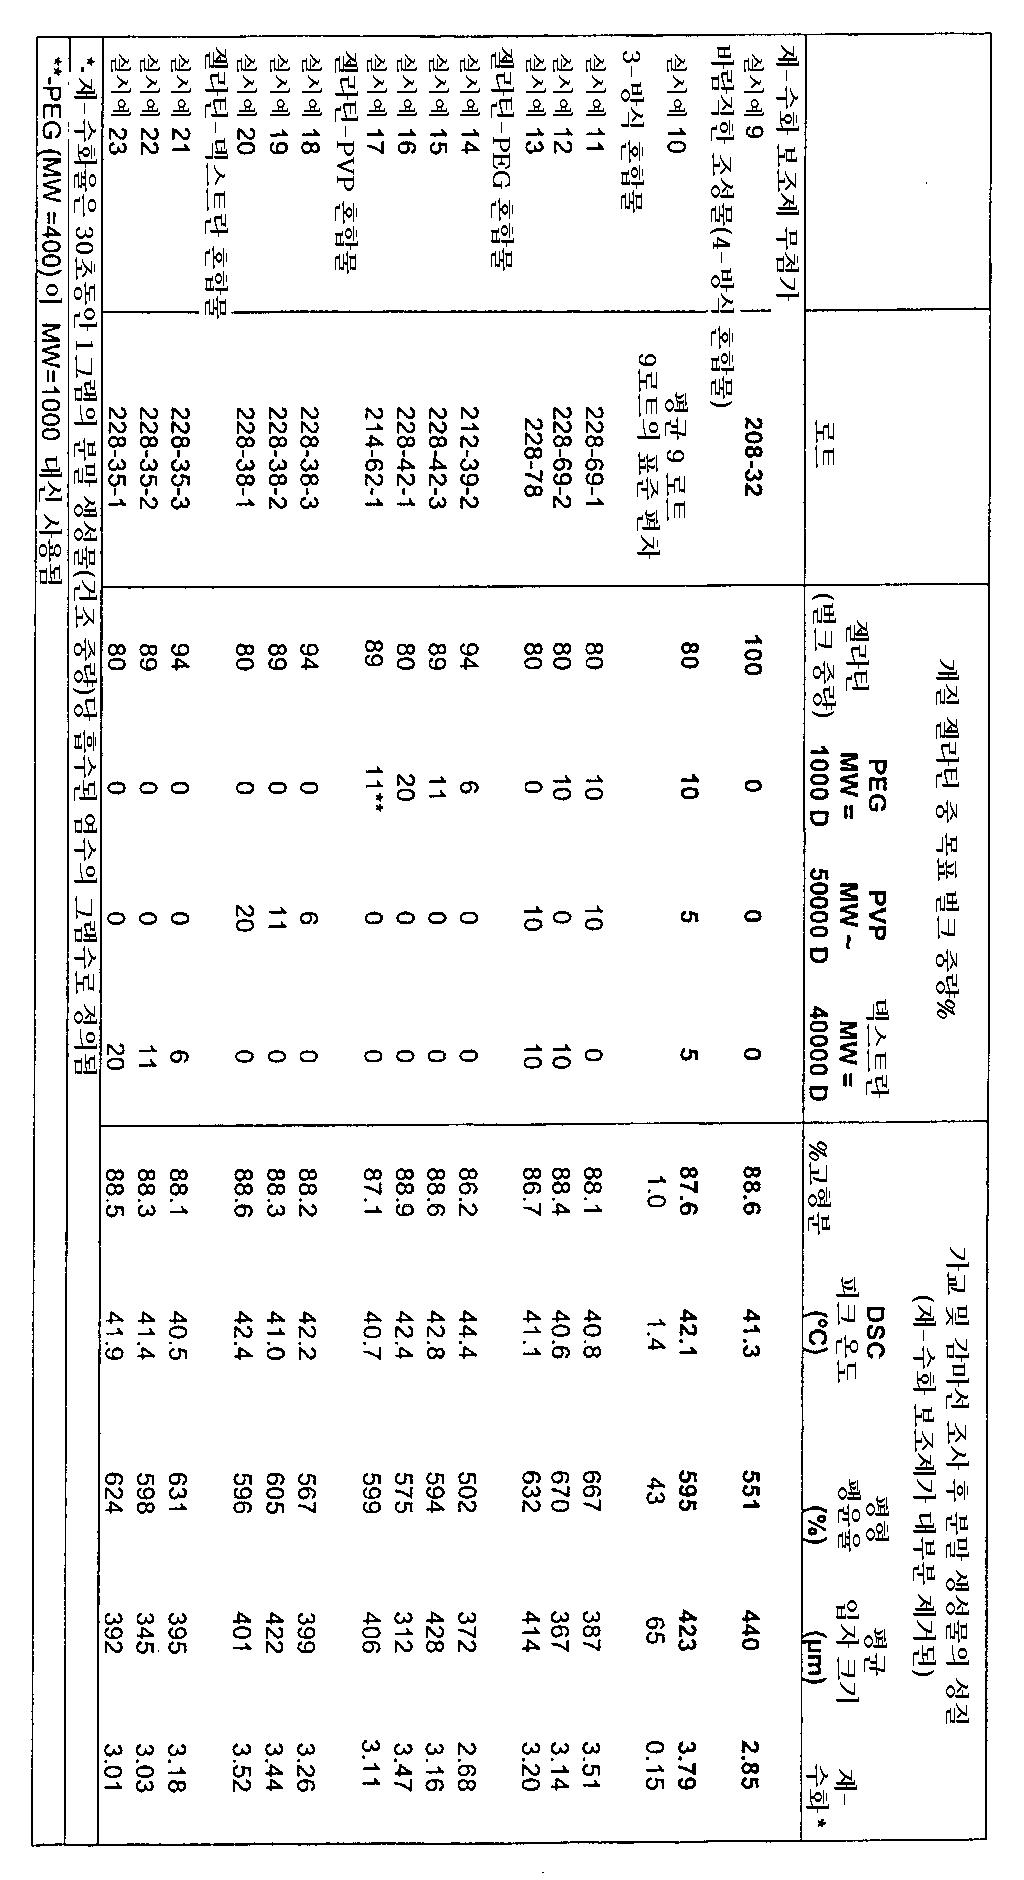 Figure 112004001405996-pct00001